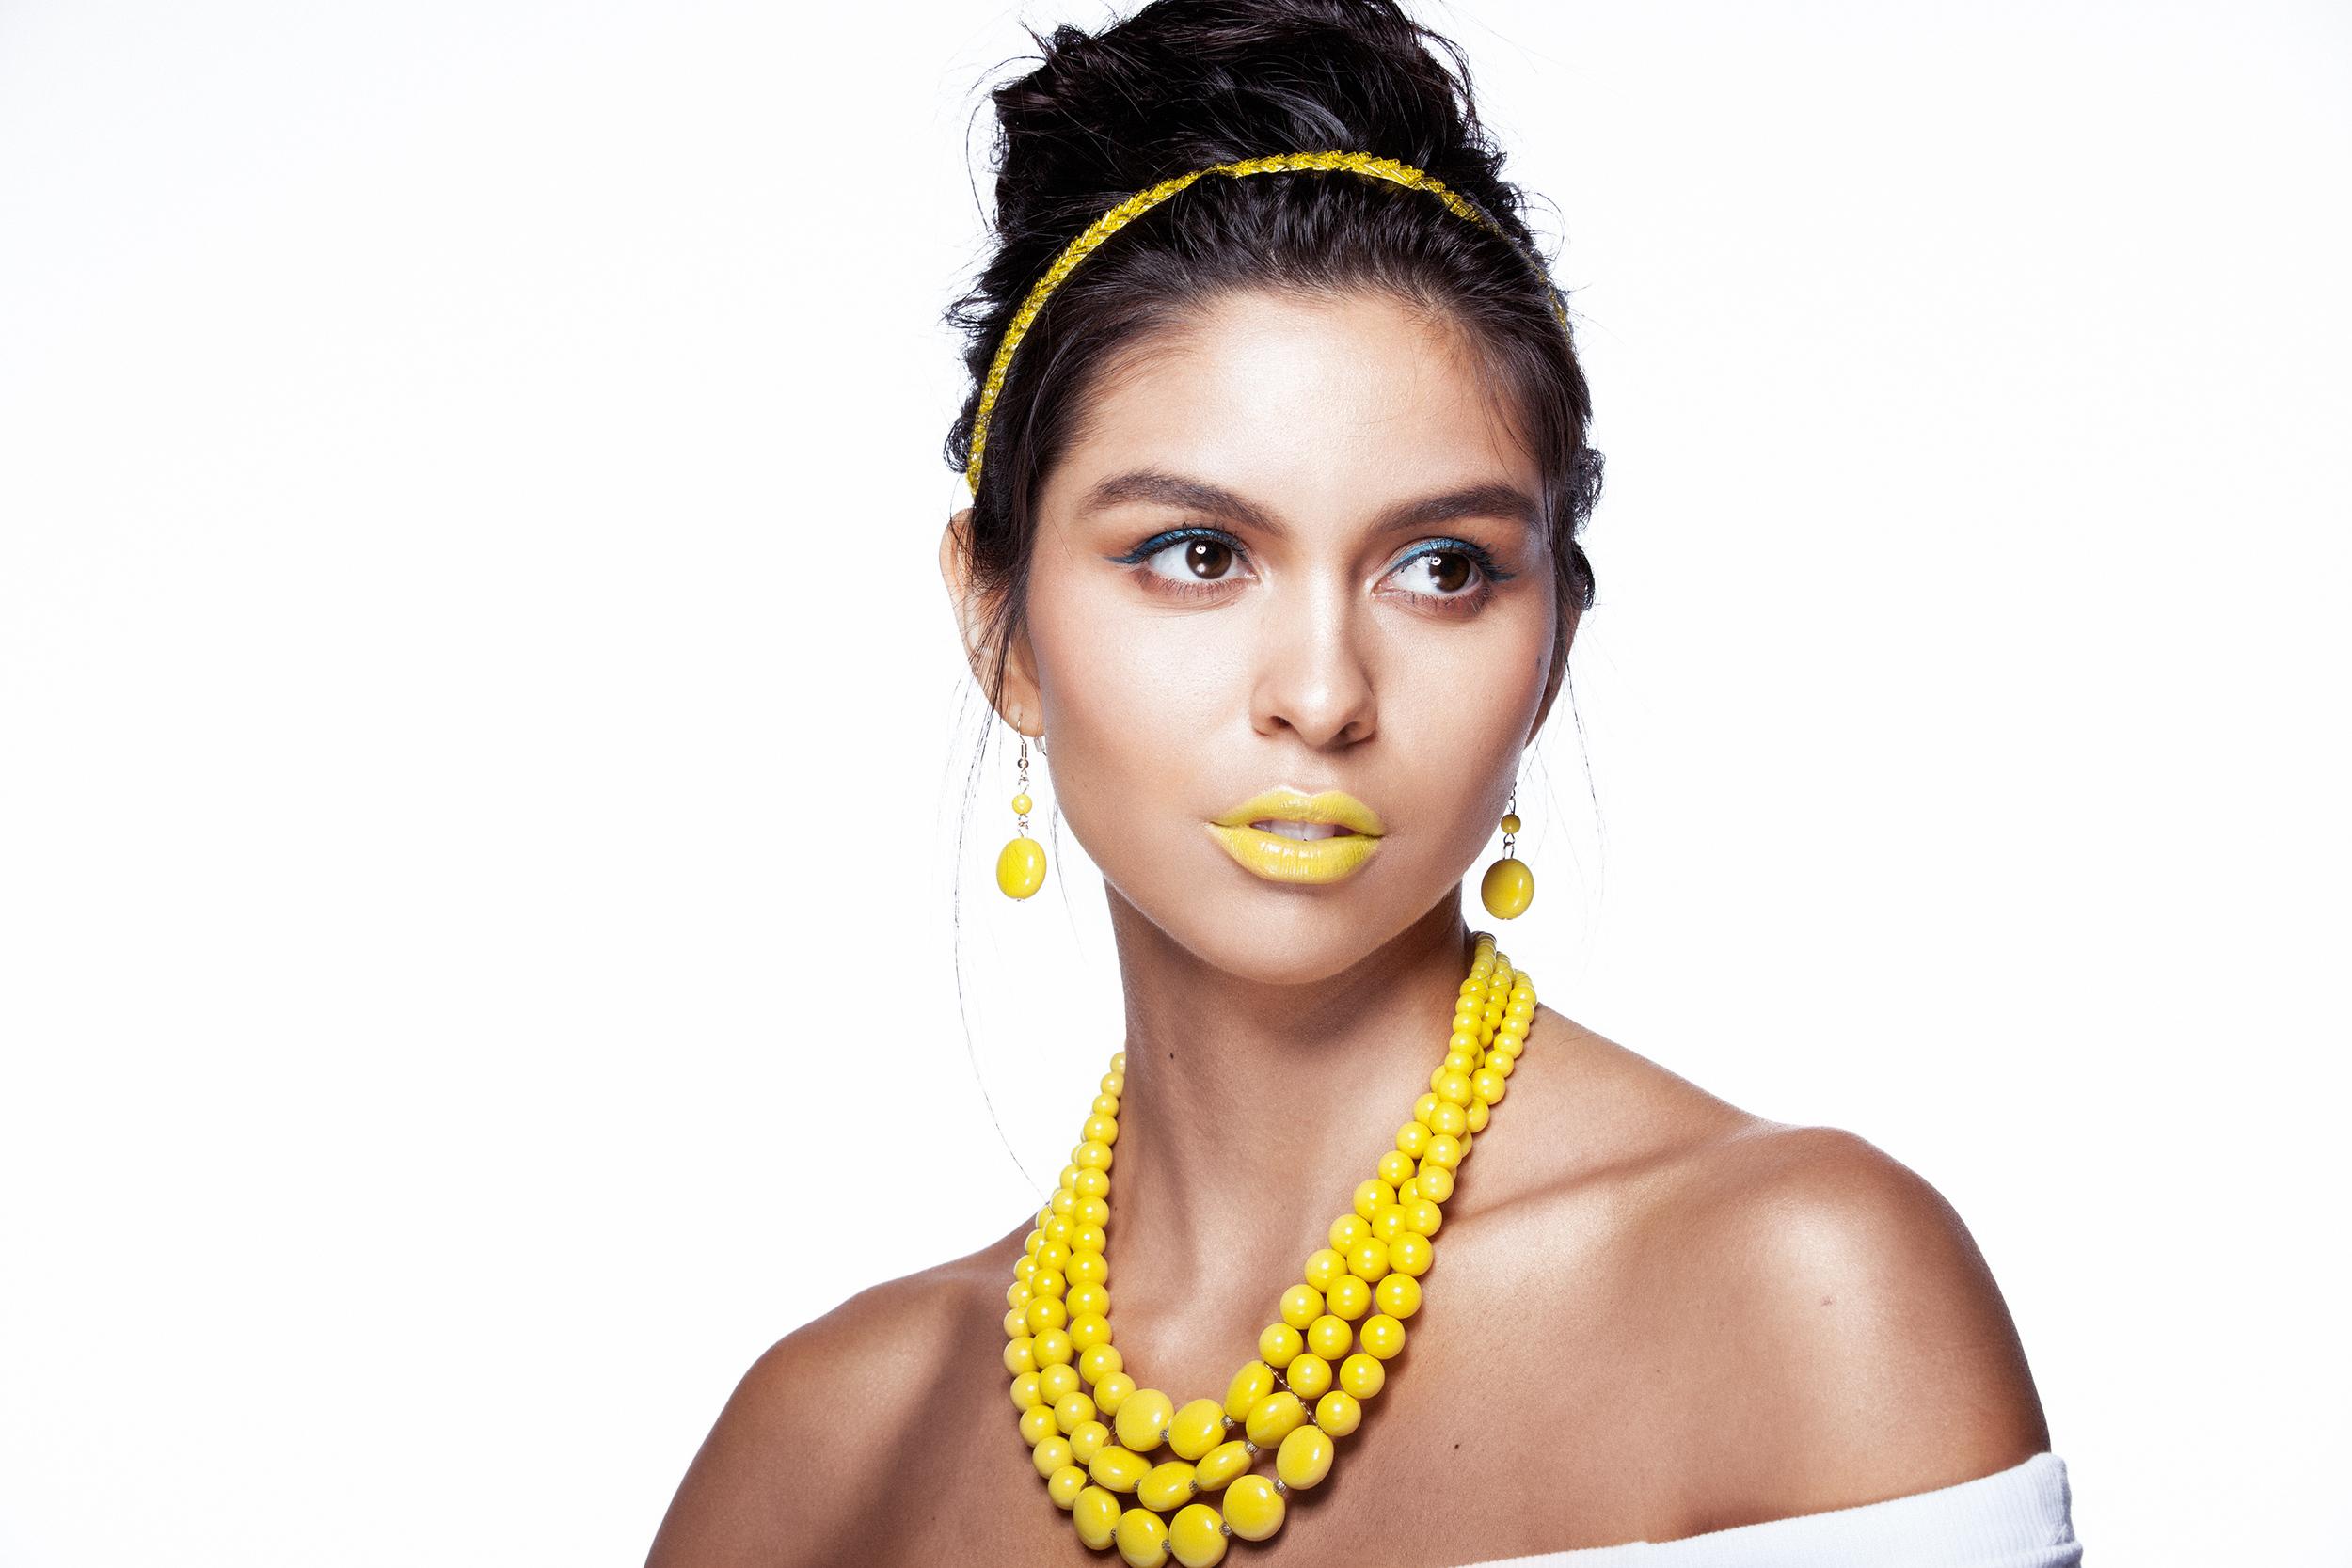 Model: Carolina Urrea //Makeup & Hair:Casey Ritchie //Lighting & Coaching : Julia Kuzmenko | Visual Artist //Photo & Post: EmilieTournevachePhotography